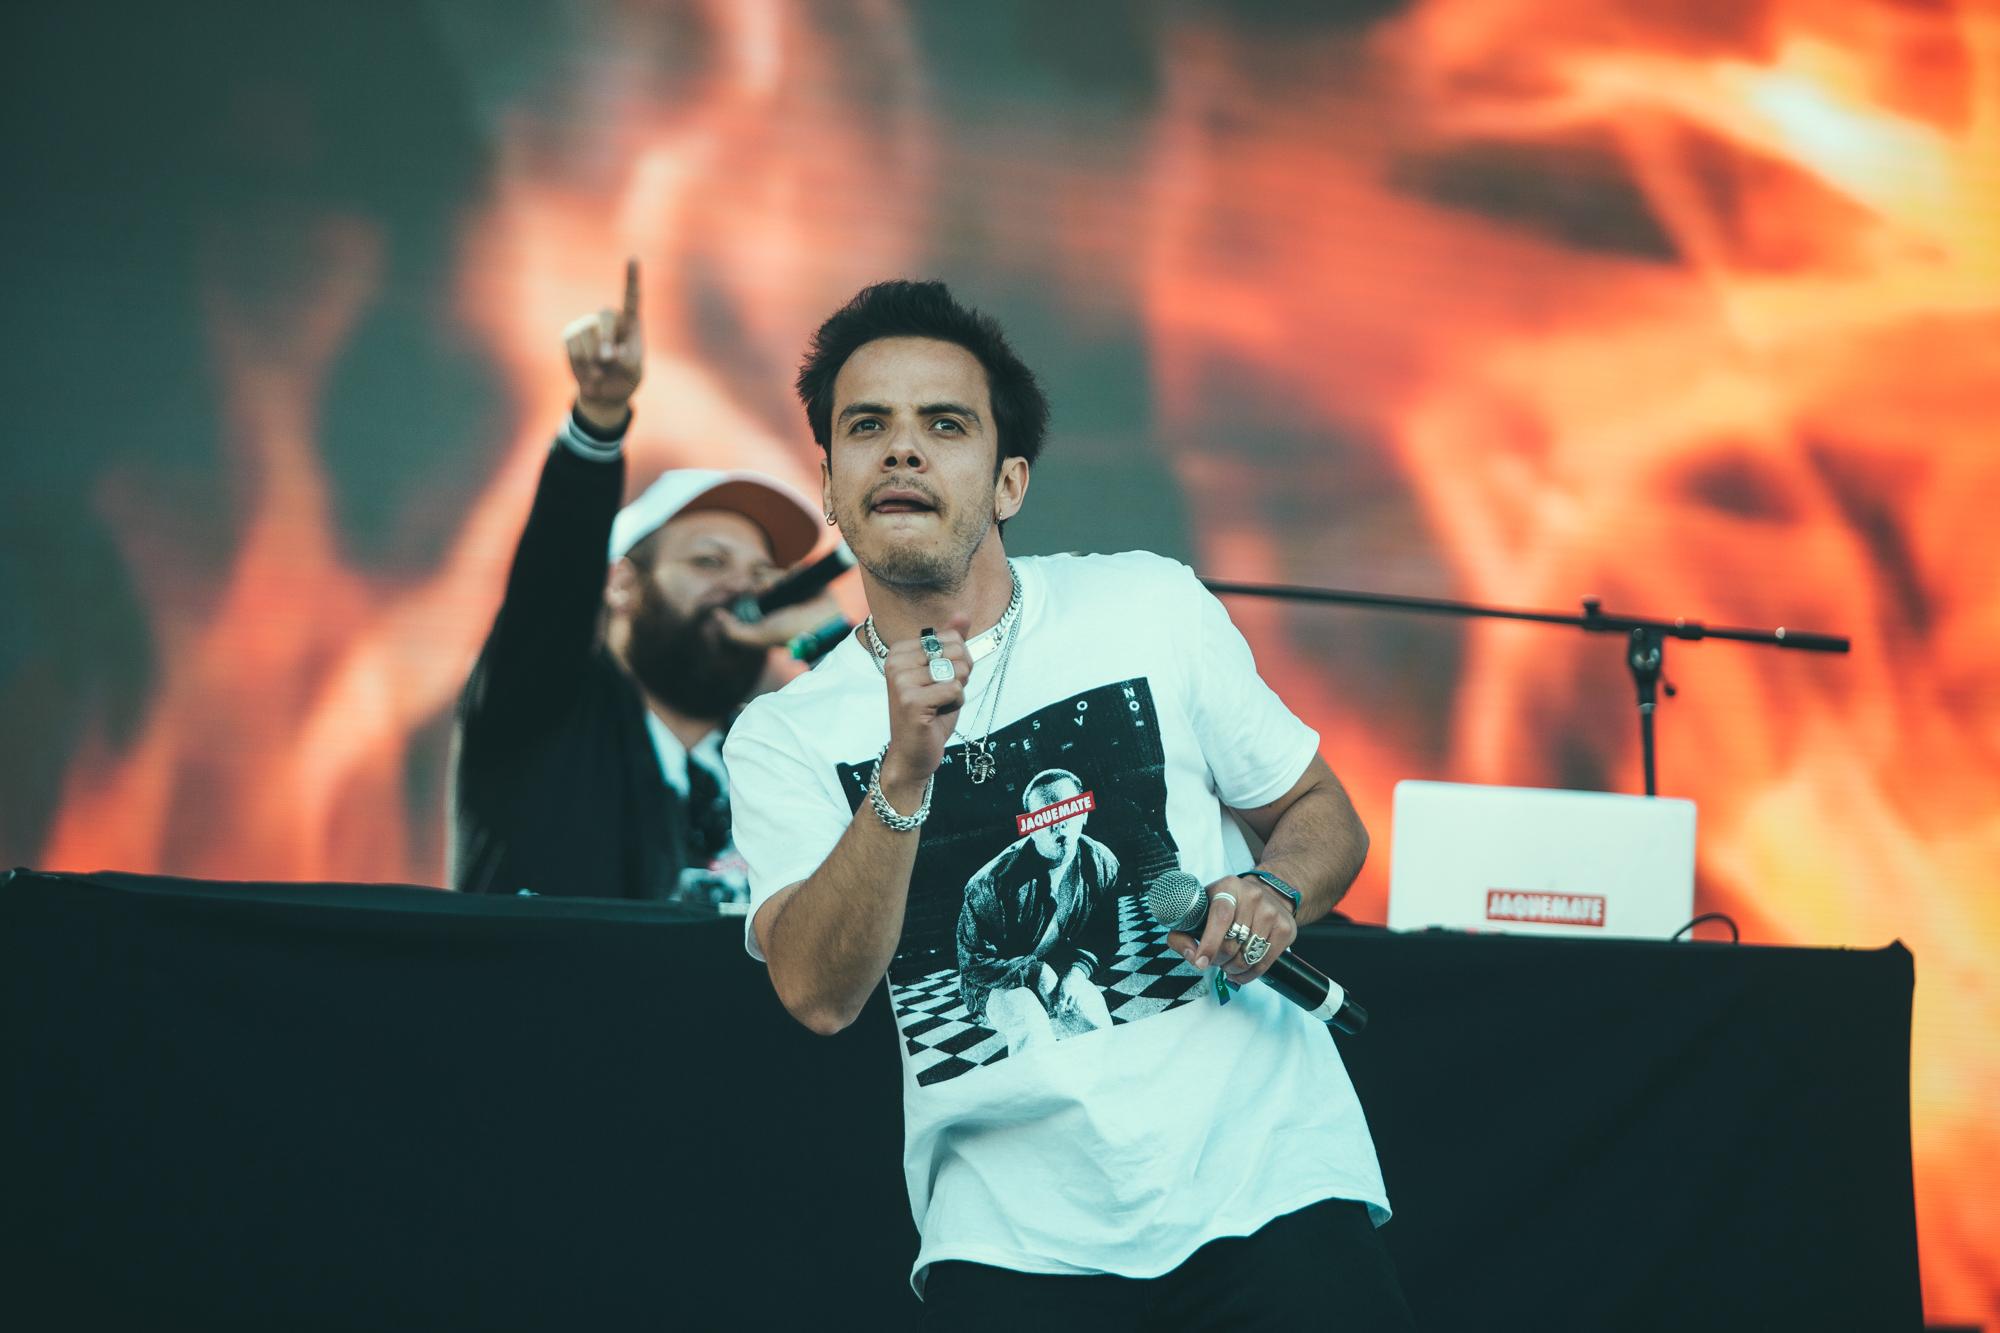 Simpson Ahuevo-Festival Ceremonia-Mexico-Foro Pegaso-04.02.2017-Daniel Patlan_Desde 1989 (14 of 19).jpg